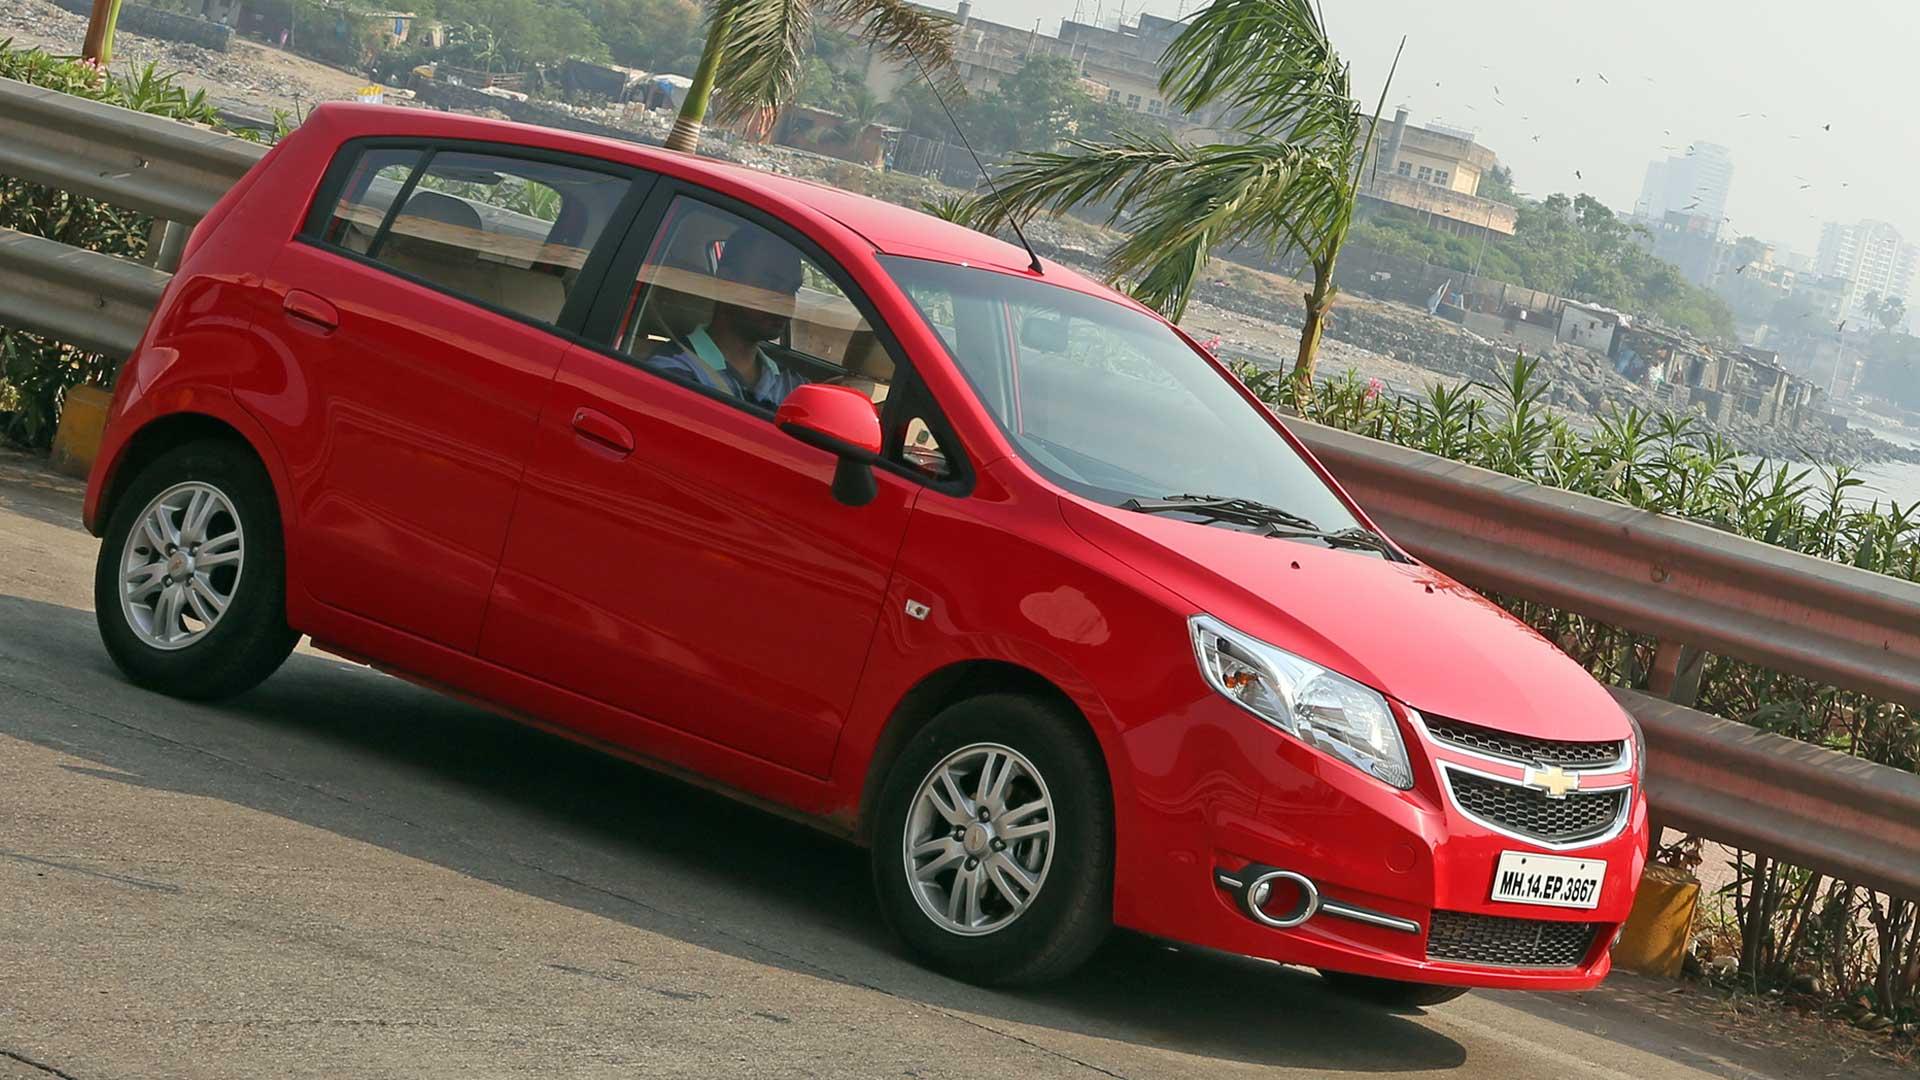 Chevrolet Sail U Va 2014 Price Mileage Reviews Specification